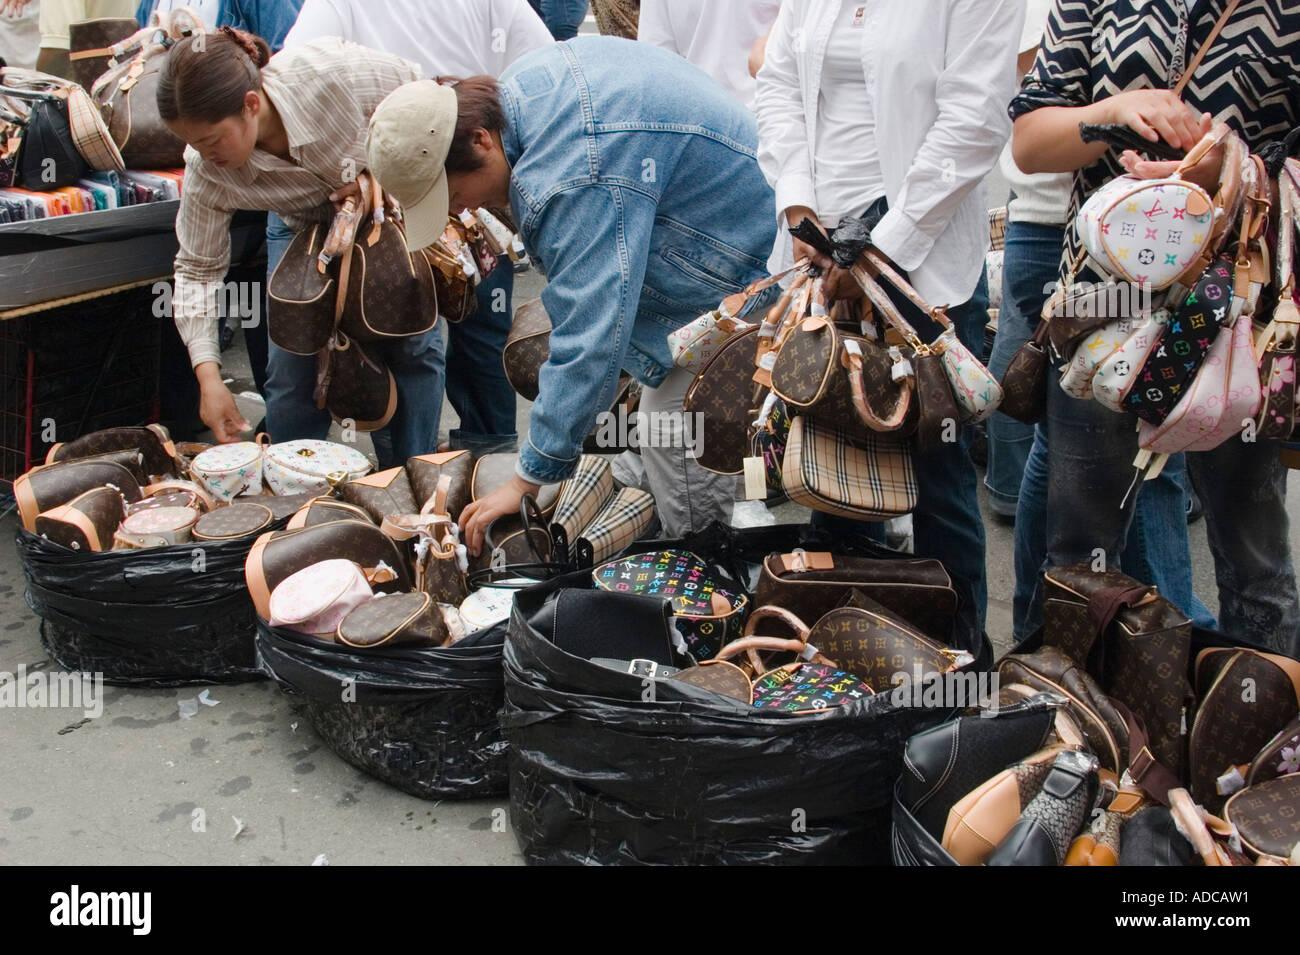 d5569f29d8b9 Handbag vendors selling knockoff handbags on Canal Street Lower Manhattan  New York City New York USA